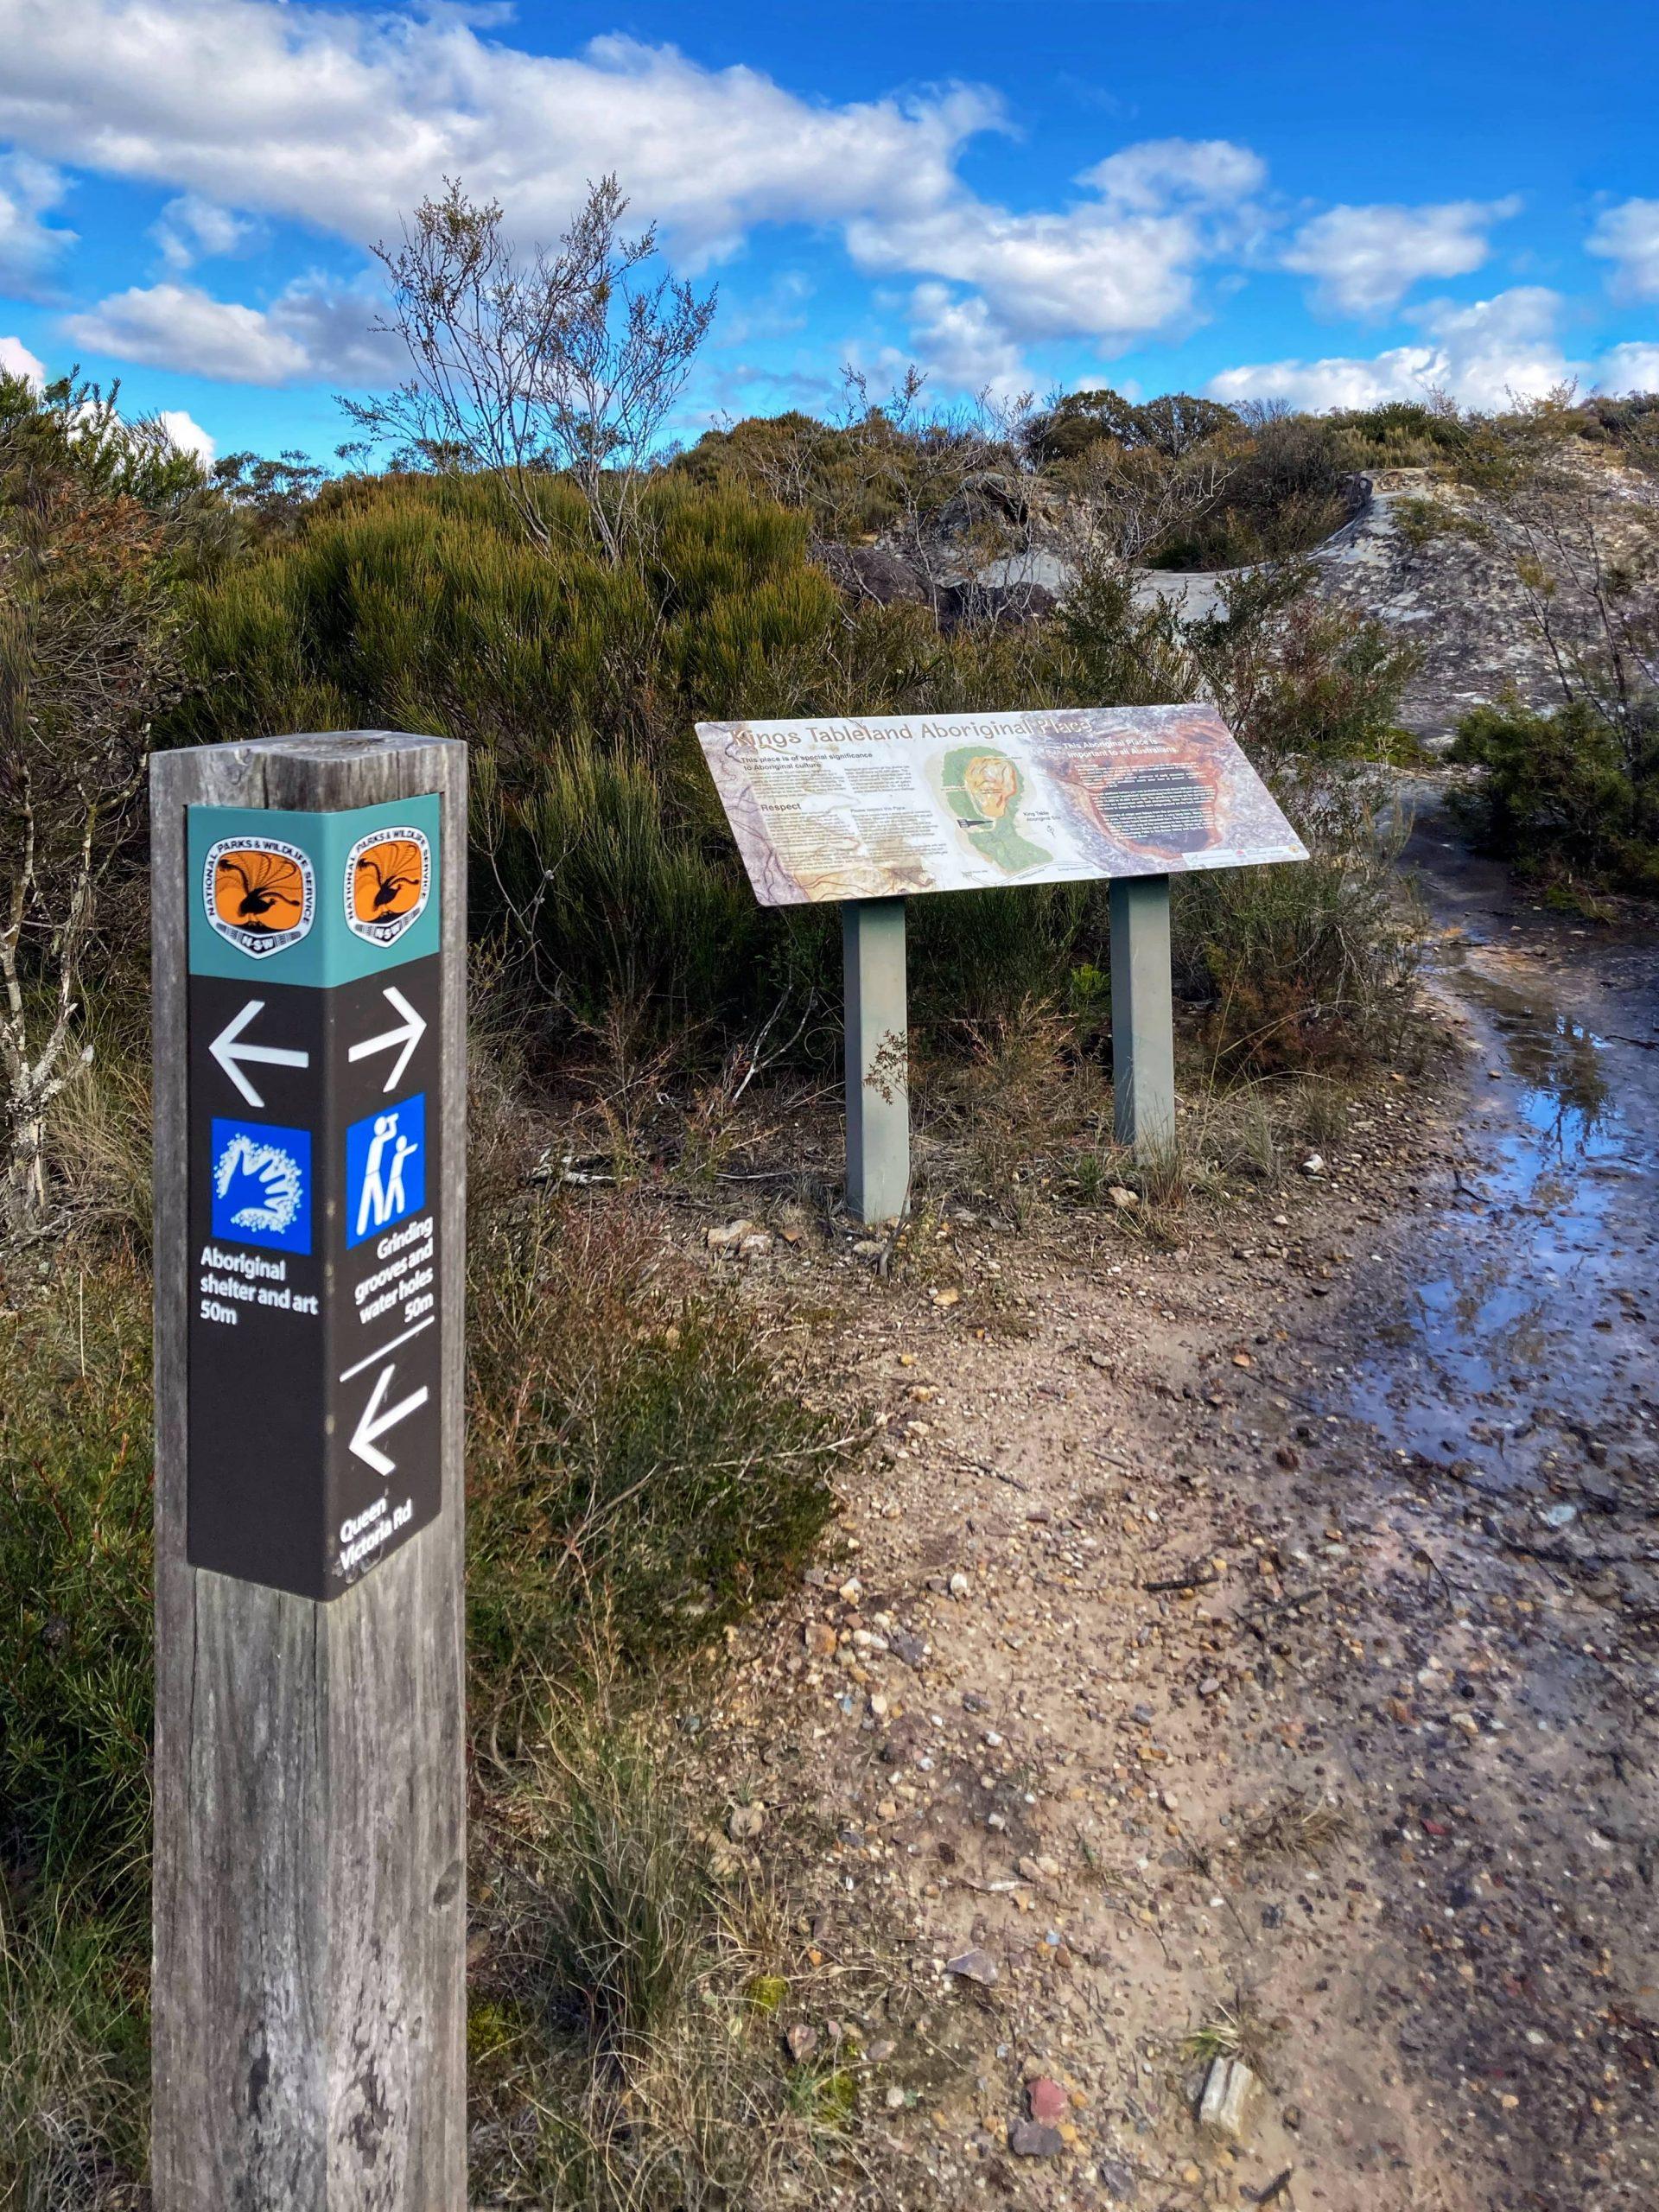 Kings Tableland Aboriginal Place Wentworth Falls